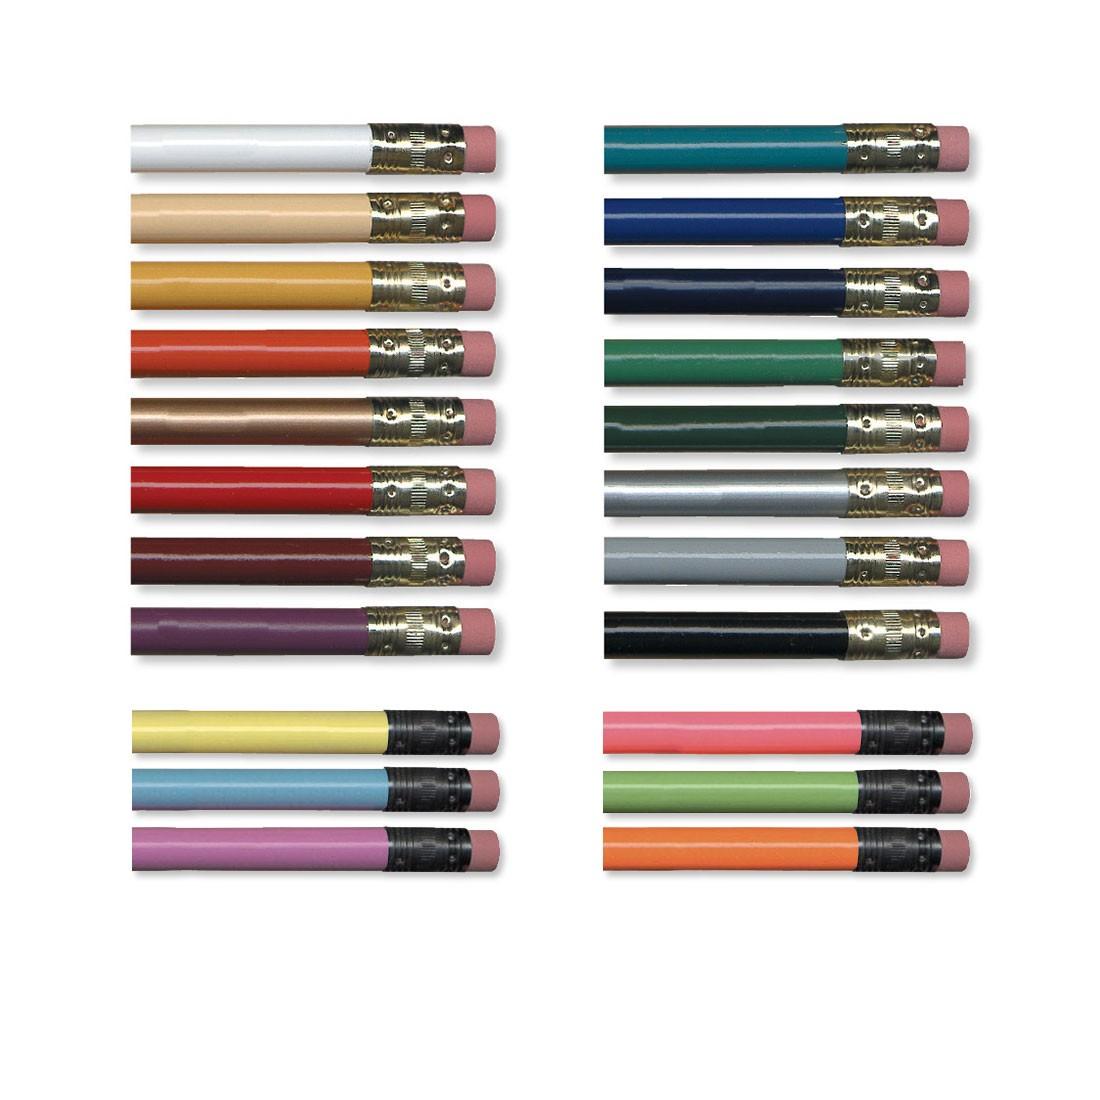 Custom Regular and Neon Pencils [image]